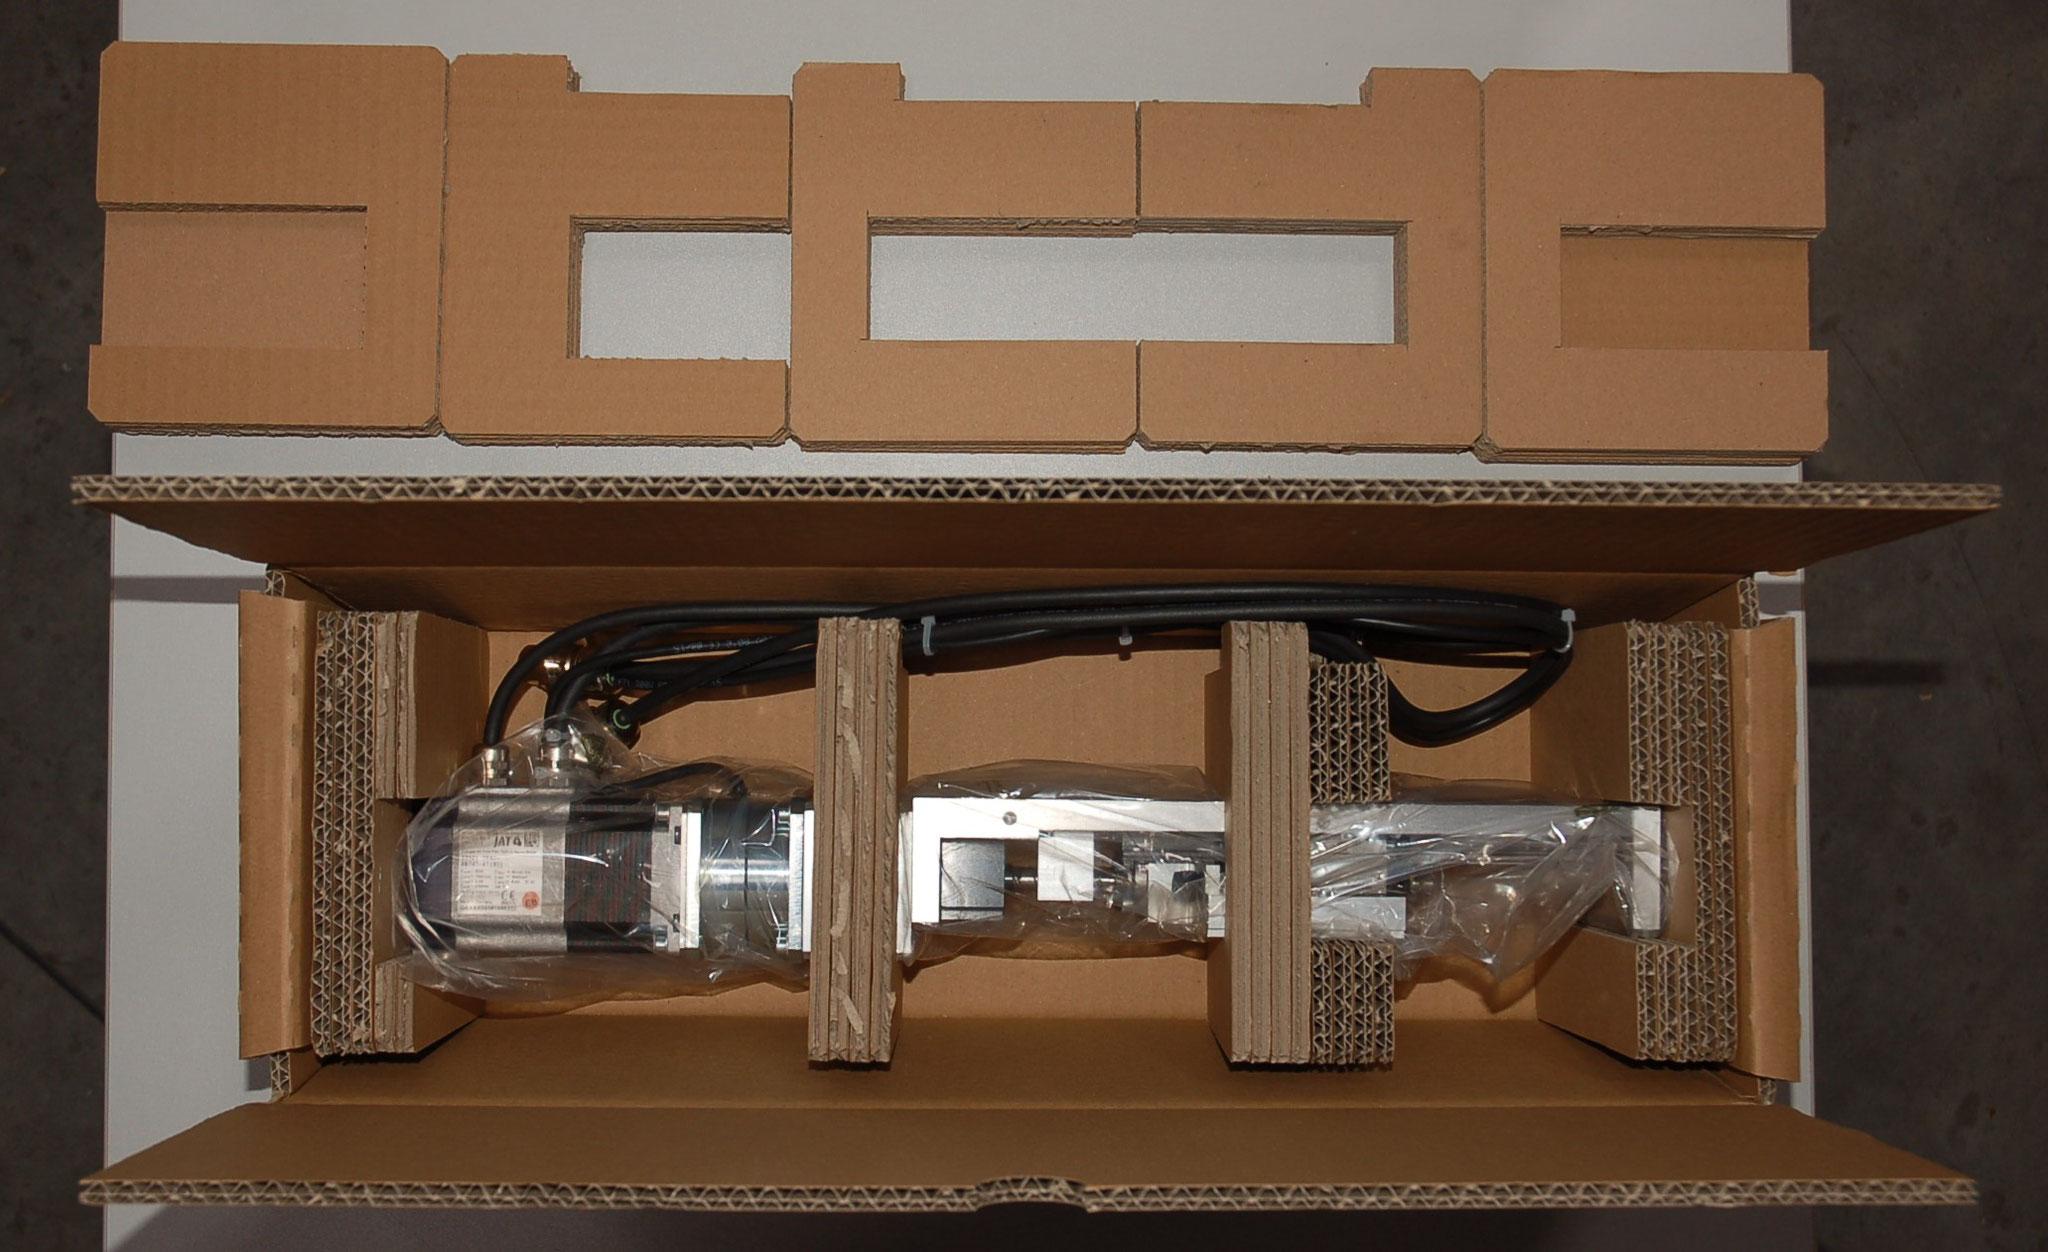 Gerätelagerungen aus Pappe